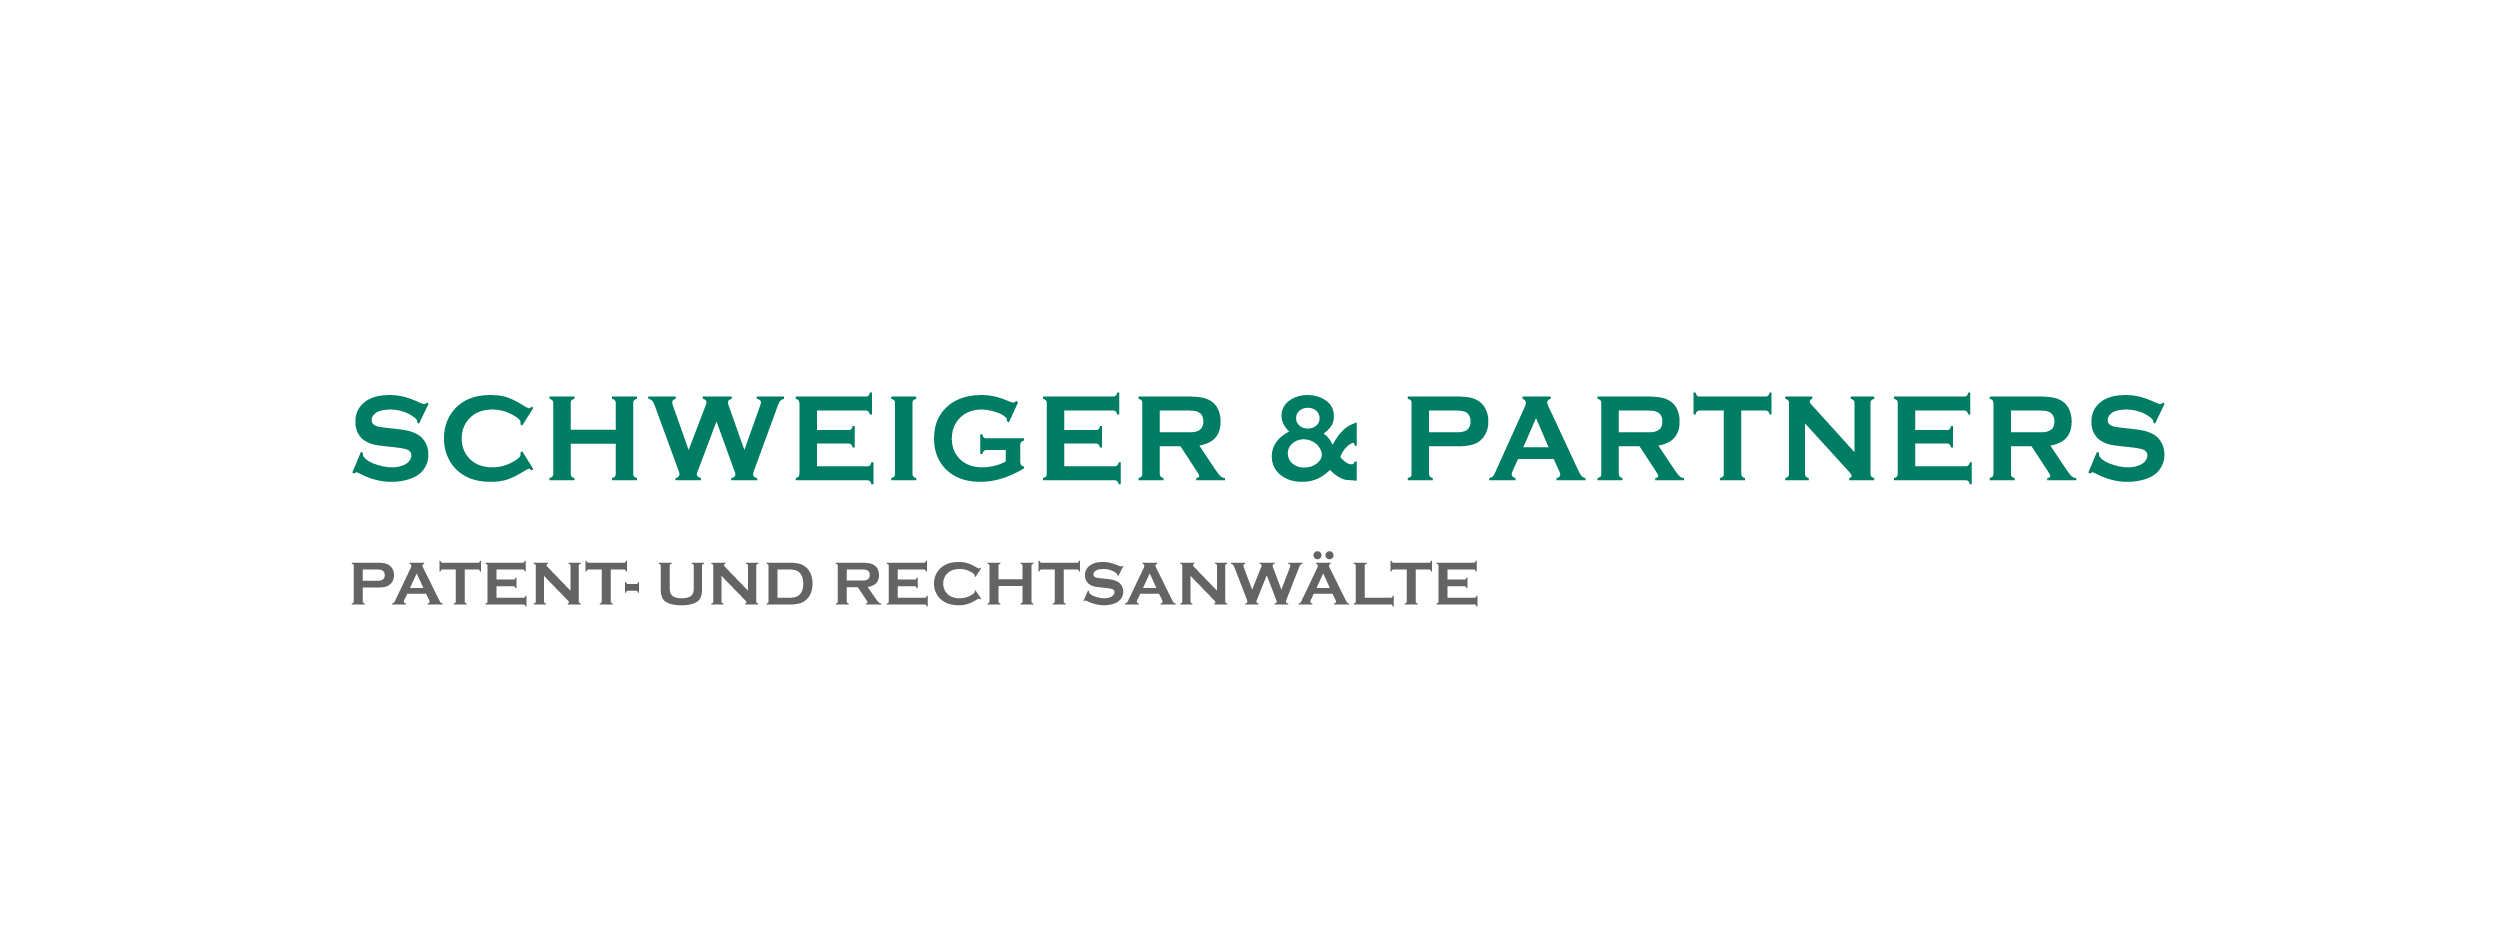 schweiger-partners-logo-1